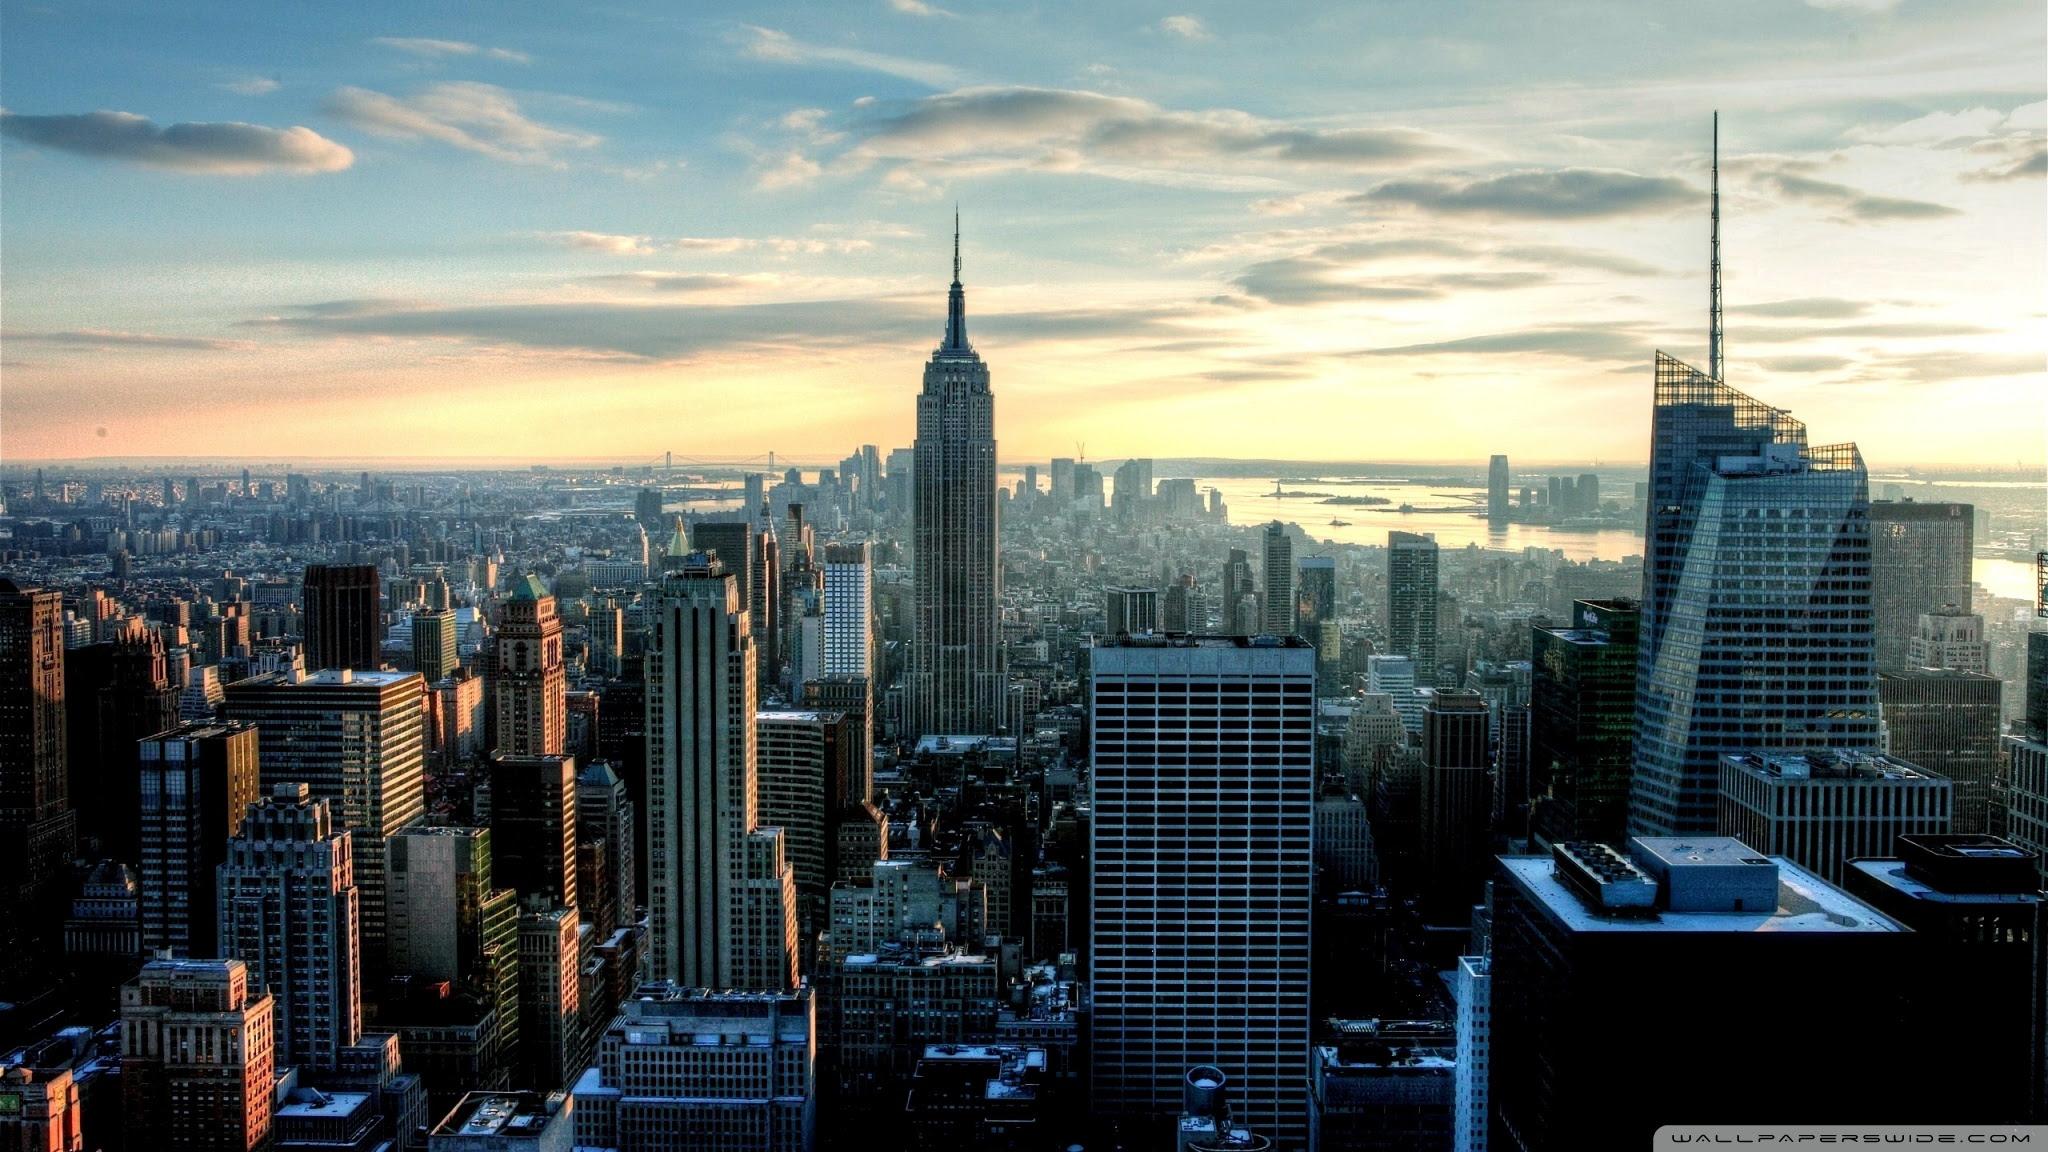 New York View Ultra Hd Desktop Background Wallpaper For 4k Uhd Tv